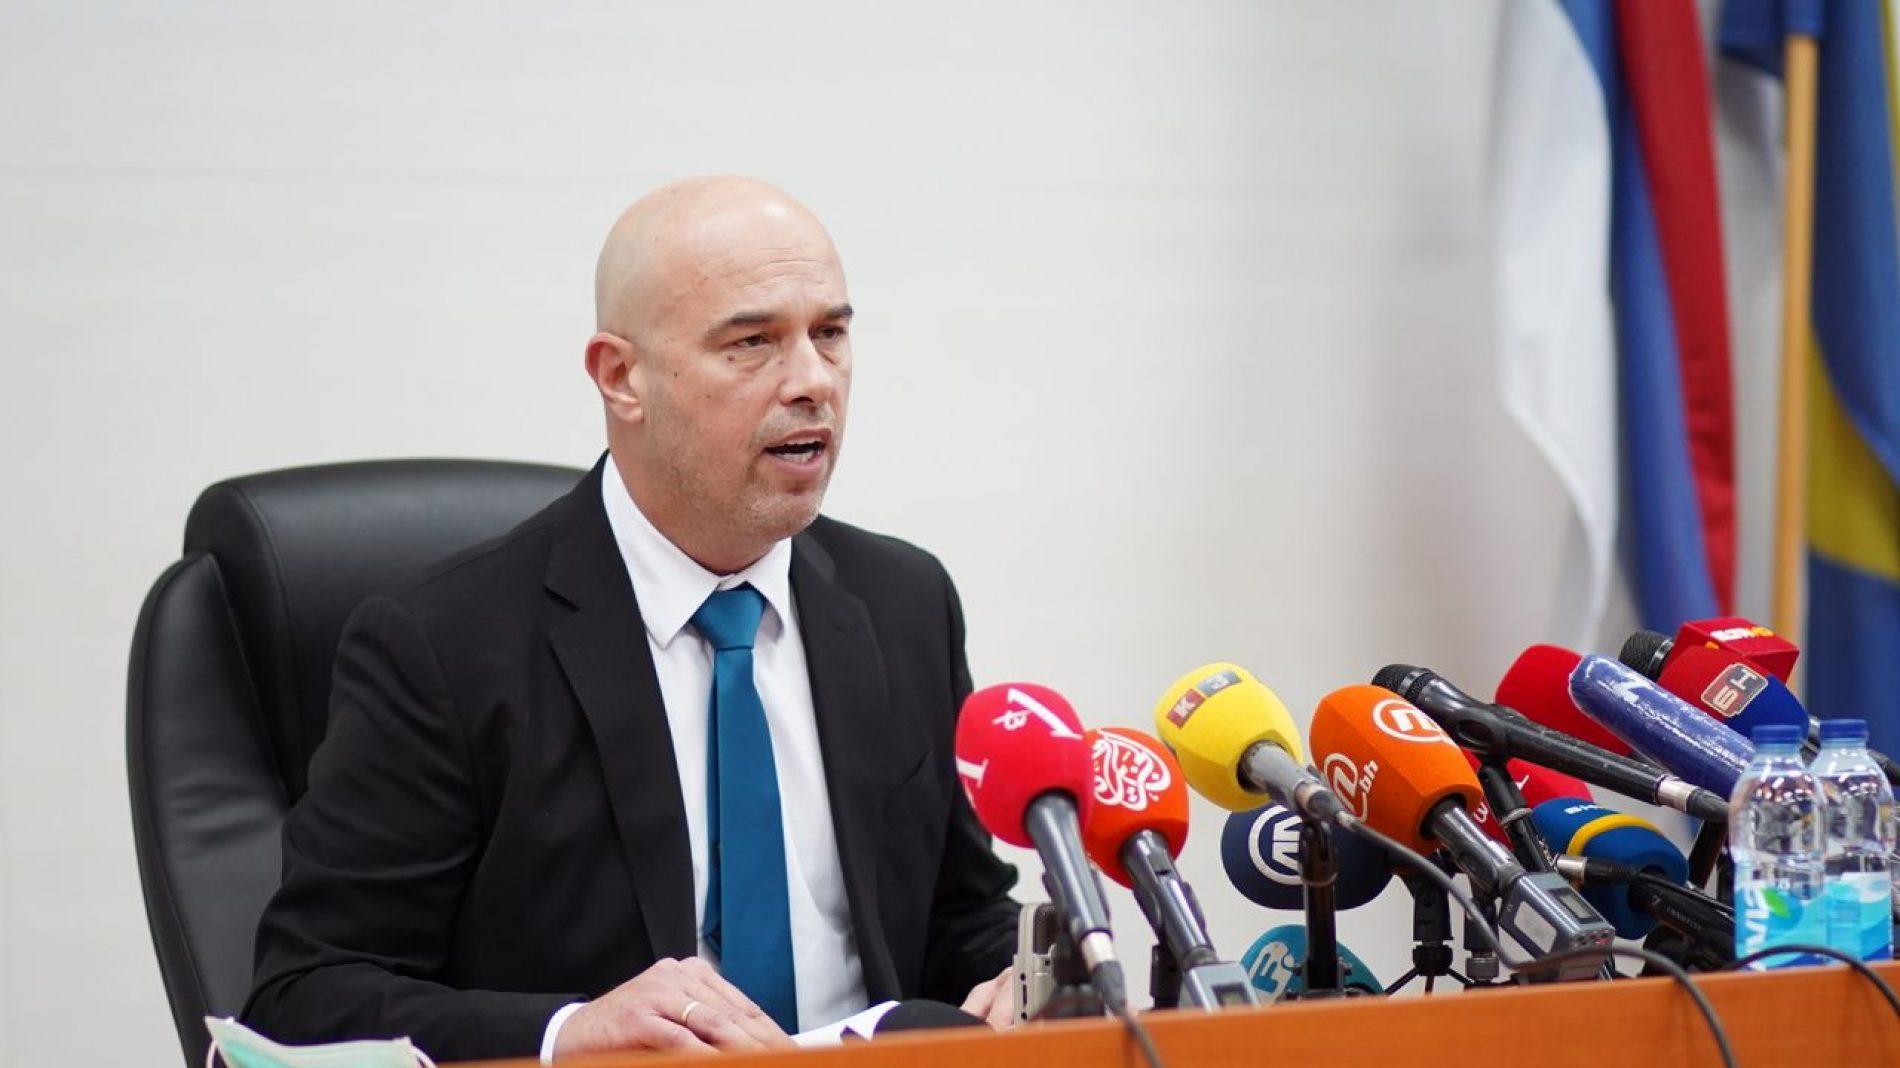 Milan Tegeltija postaje Dodikov savjetnik, obustavljaju se disciplinski postupci protiv njega